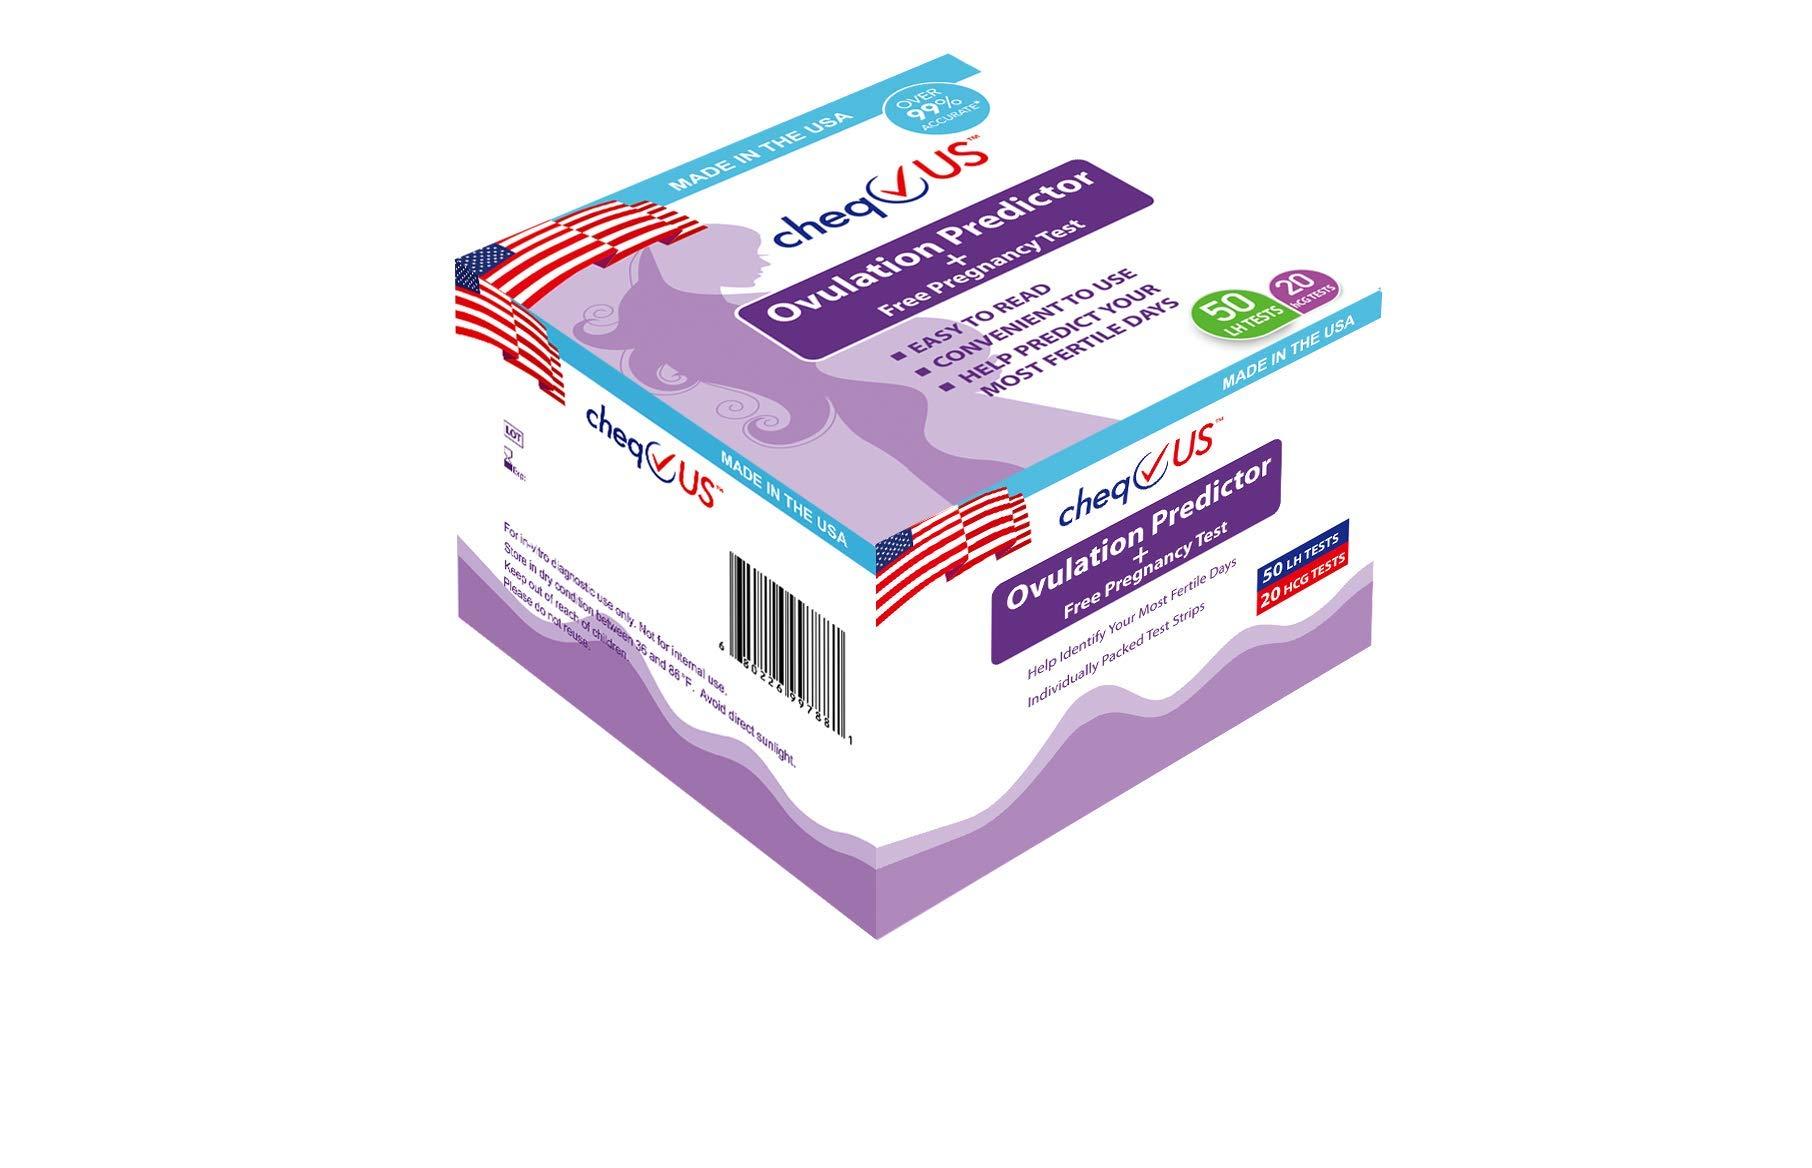 CheqUS Combo Pack 50 Piece Lh Ovulation Predictor Urine Test Strip and 20 Piece Pregnancy Urine Test Strip, 70 Count by cheqUS